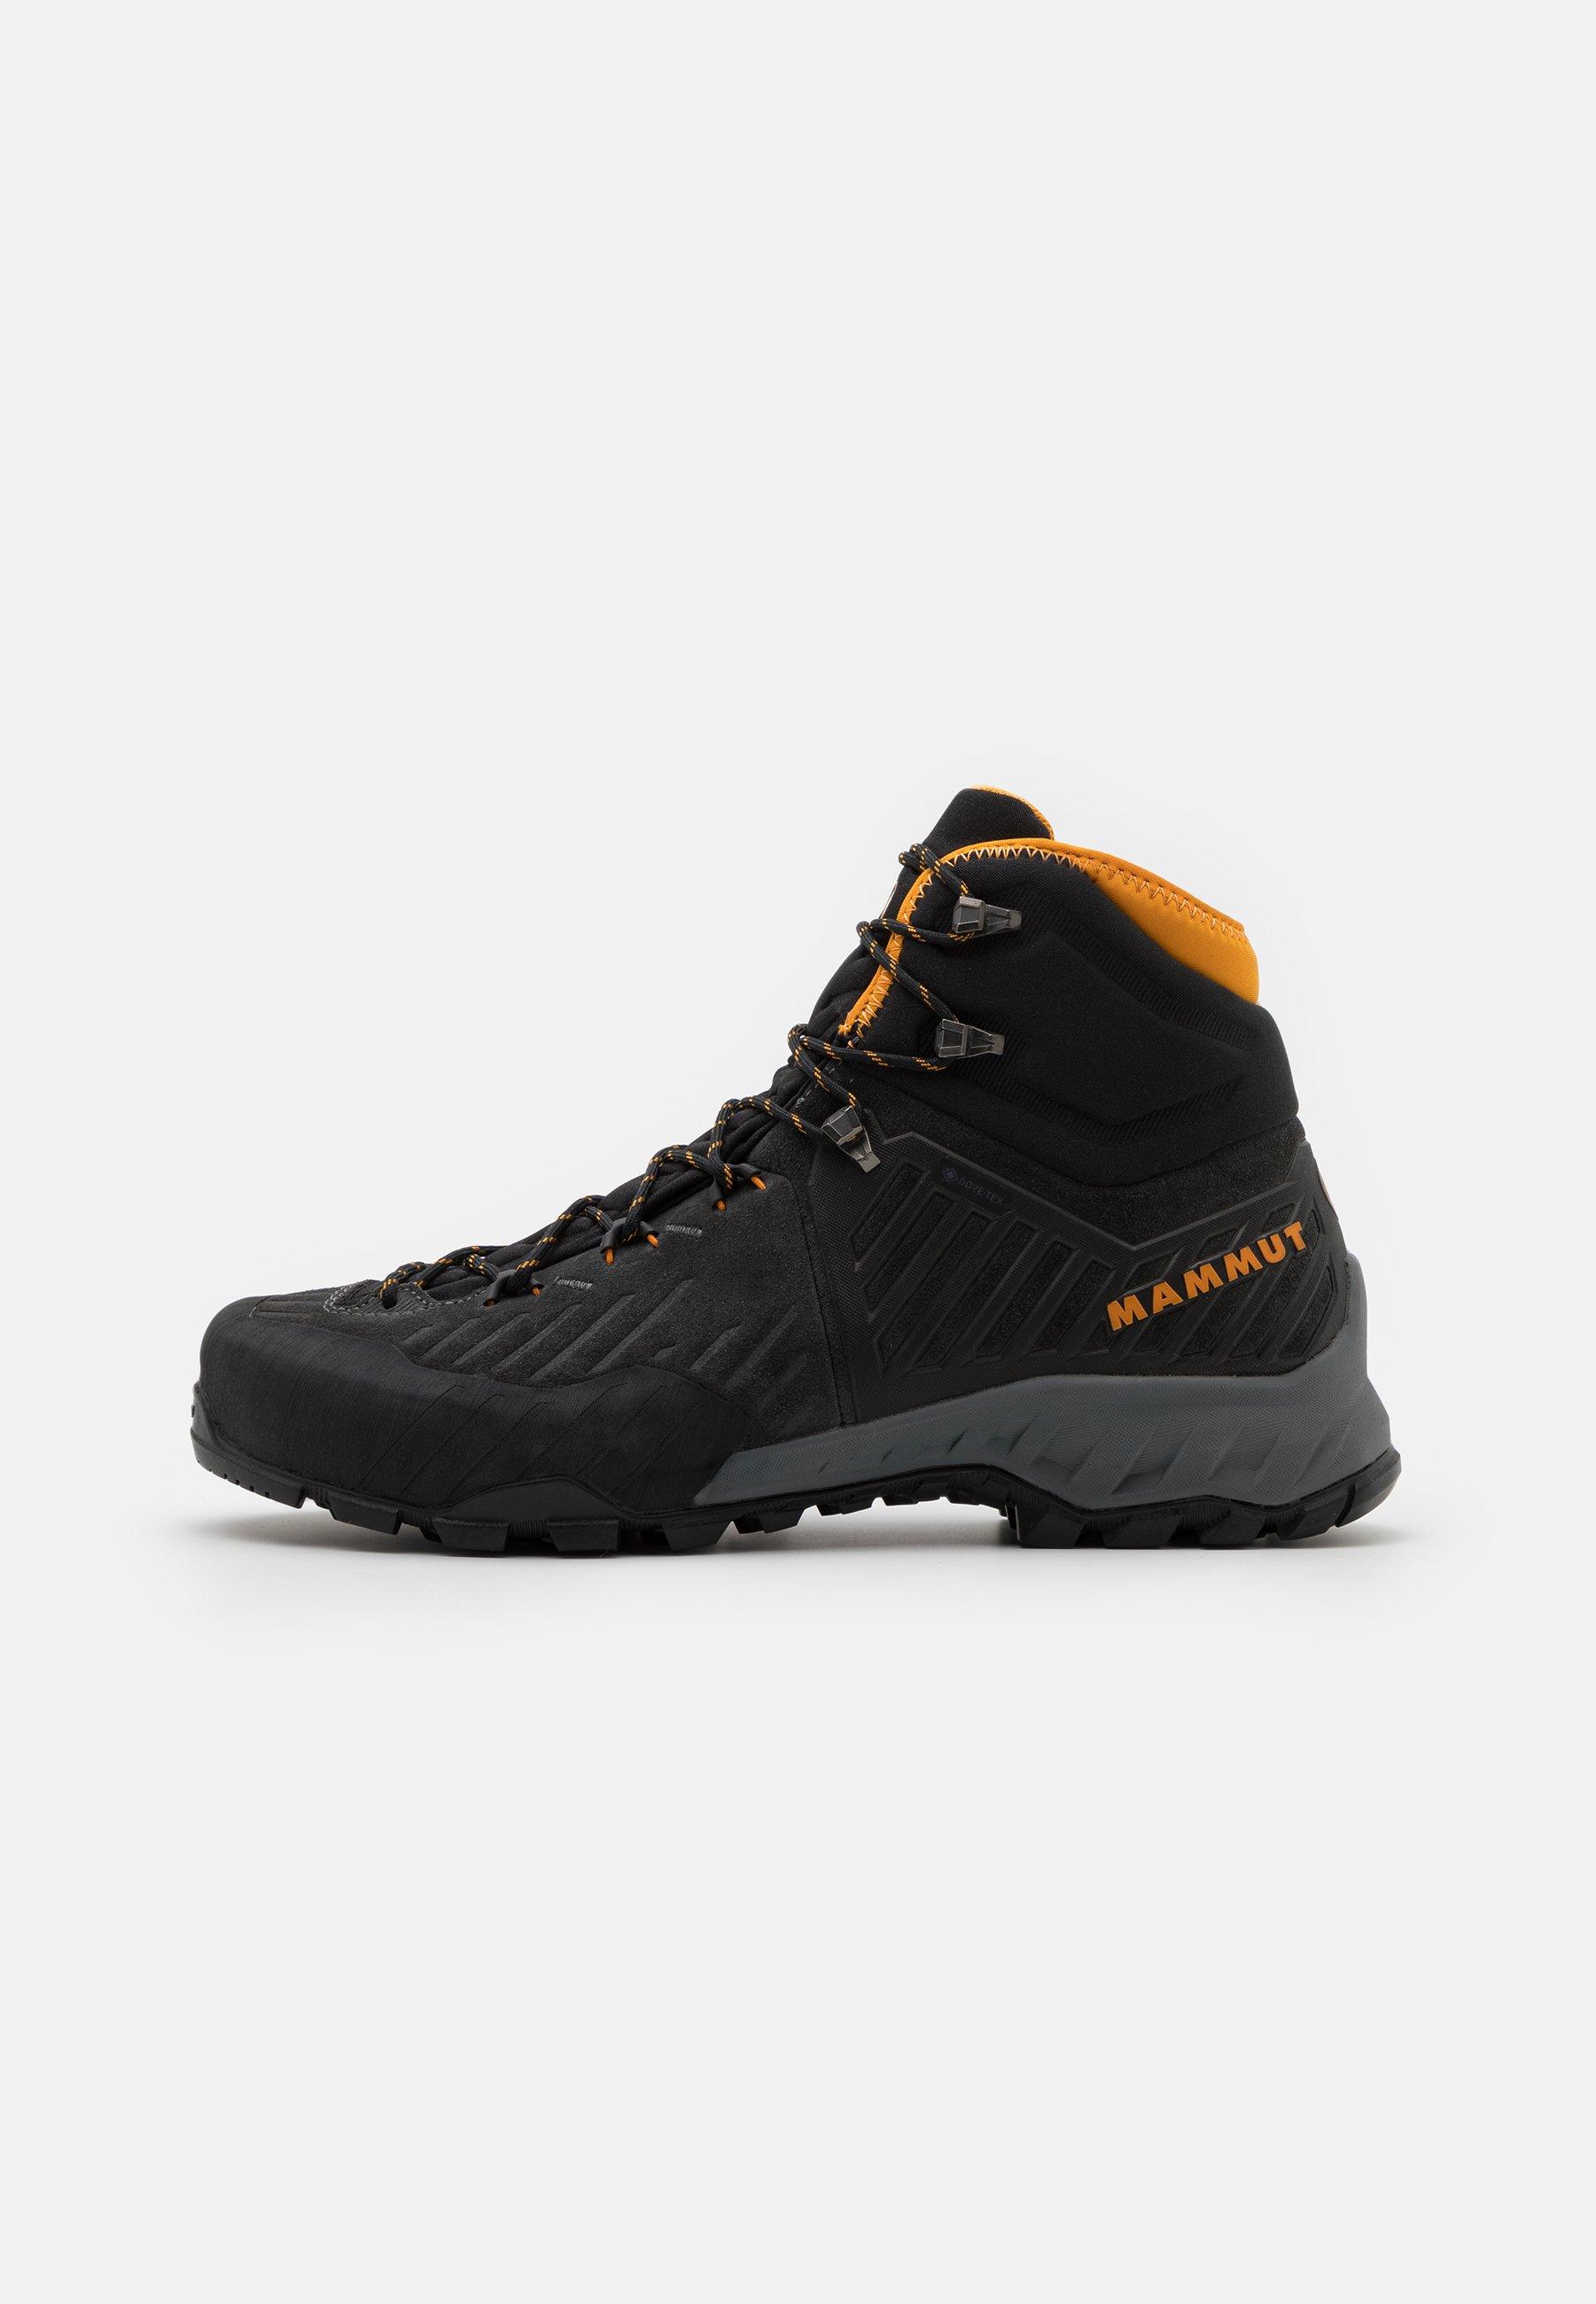 Uomo ALNASCA PRO II MID GTX MEN - Scarpa da hiking